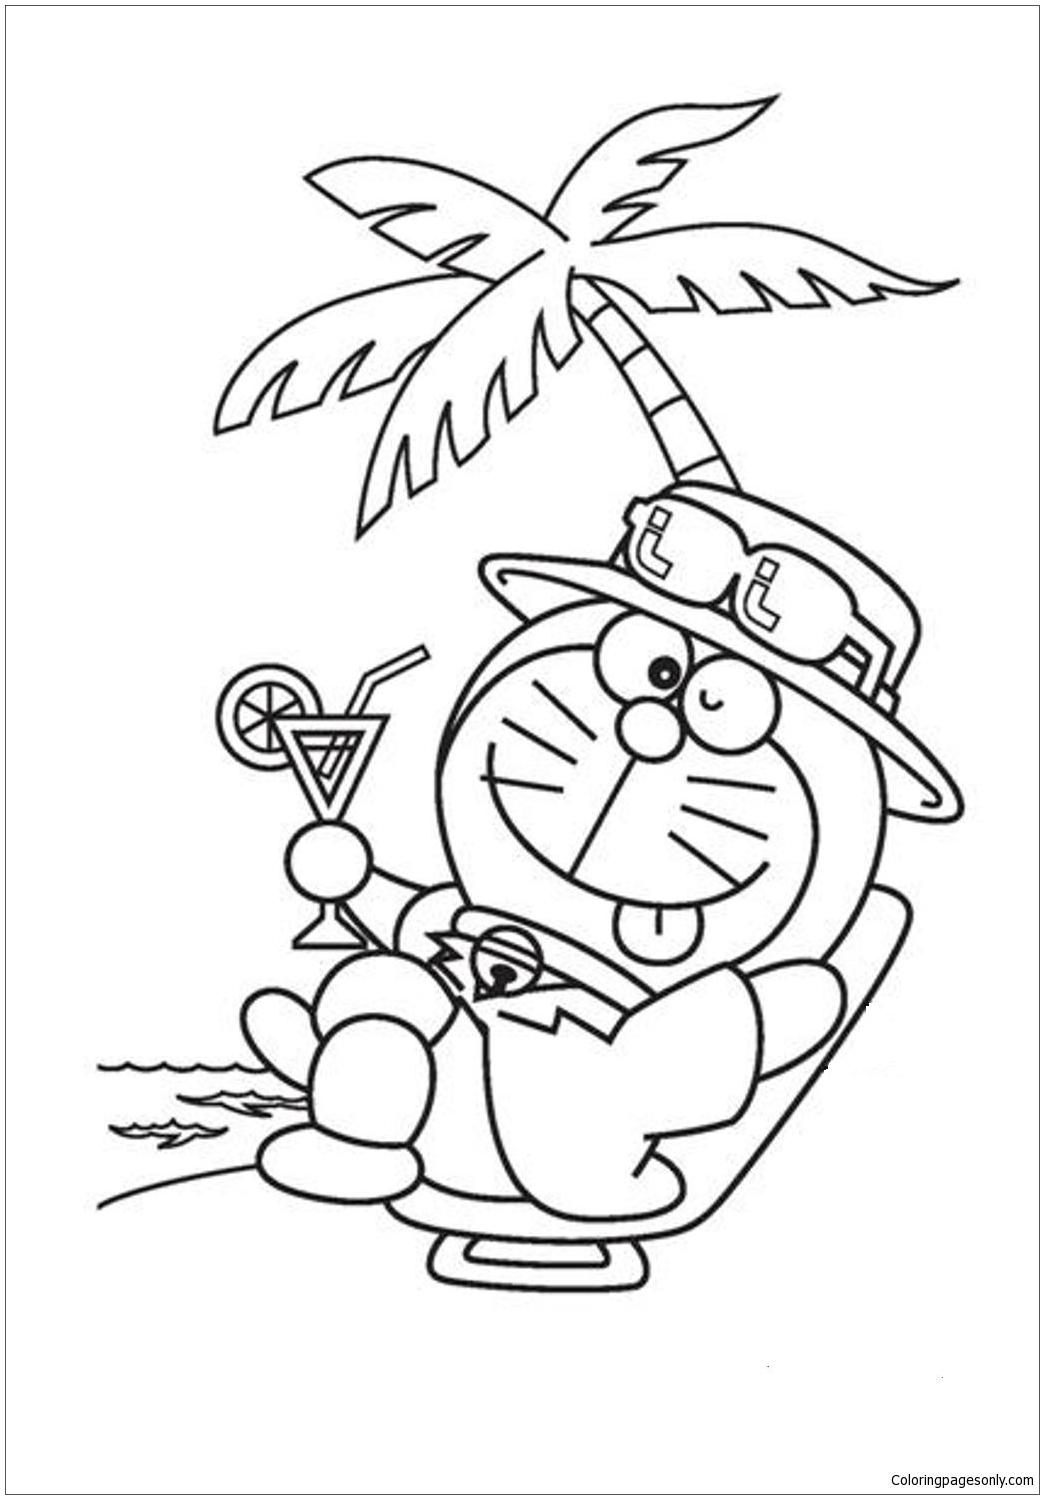 Doraemon In A Chilling Mood Coloring Pages - Doraemon ...